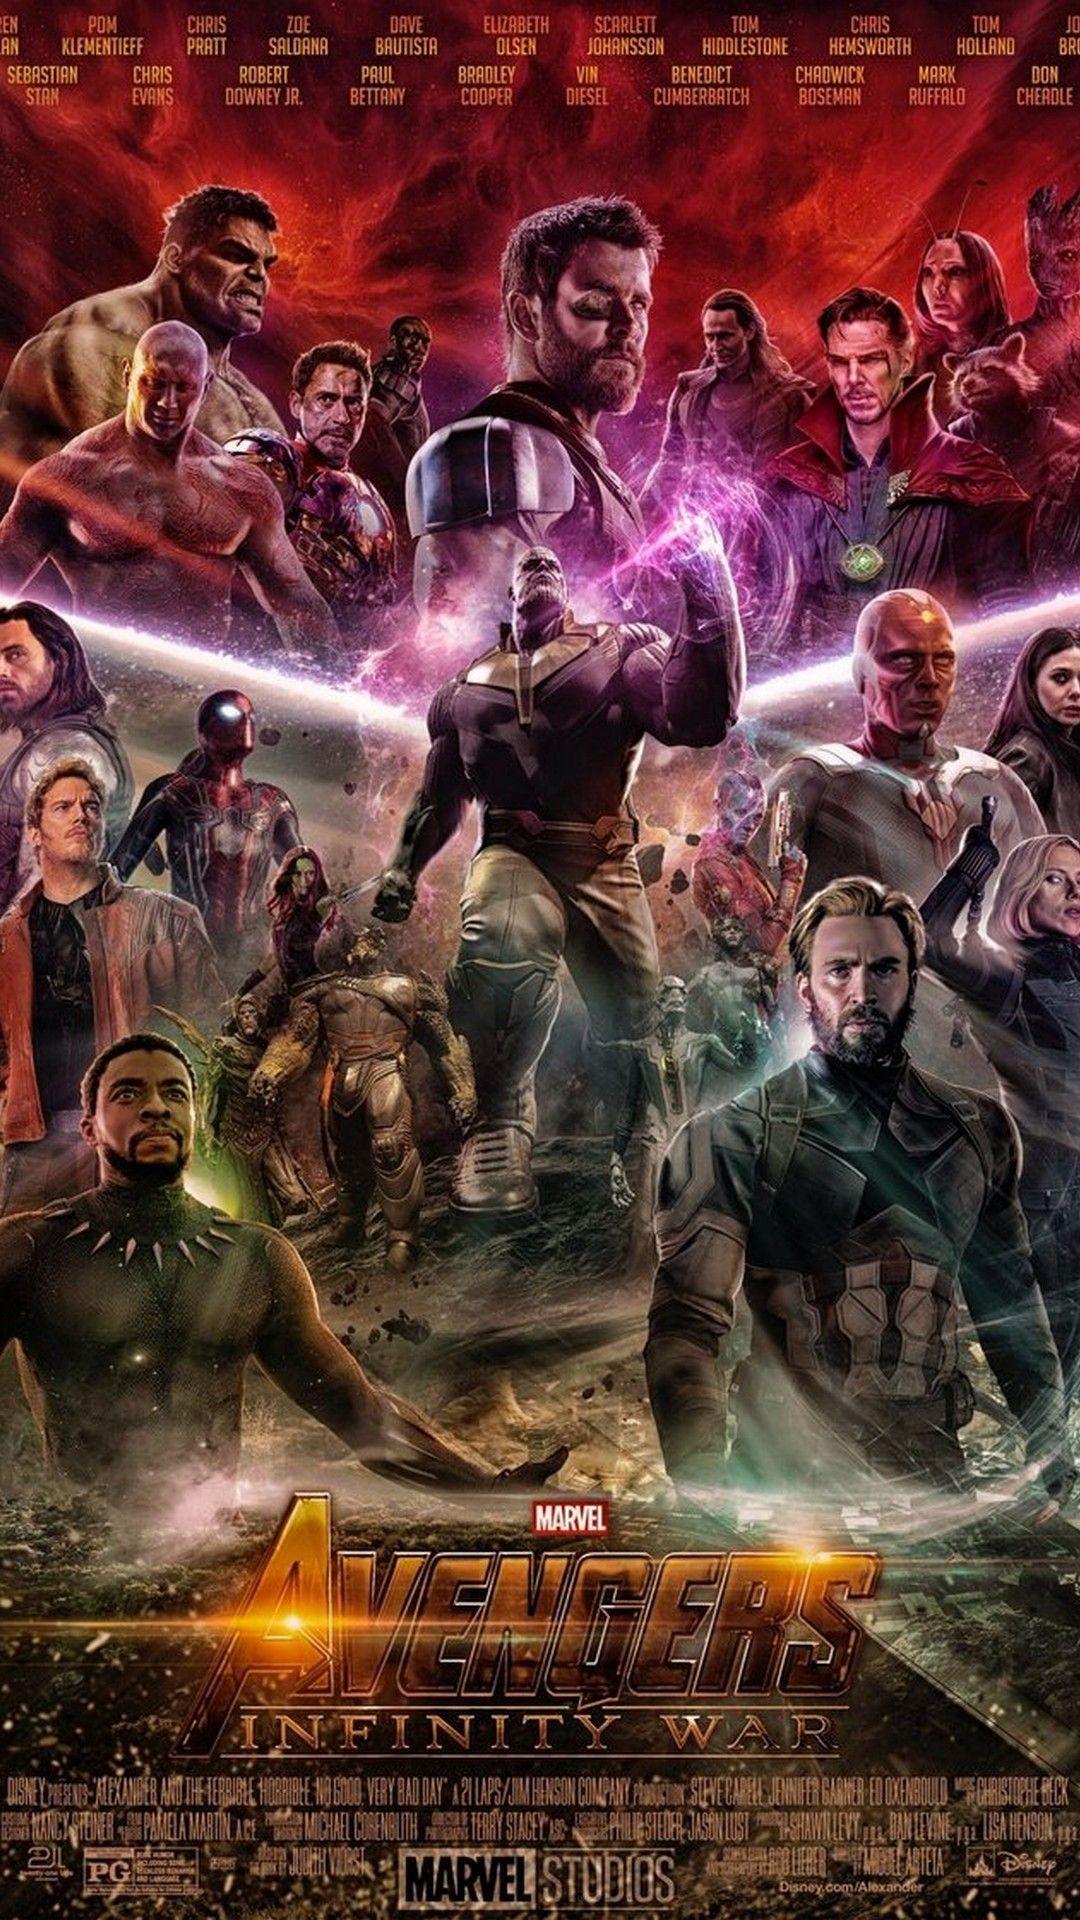 Avengers Infinity War Hd Wallpapers 7wallpapers Net